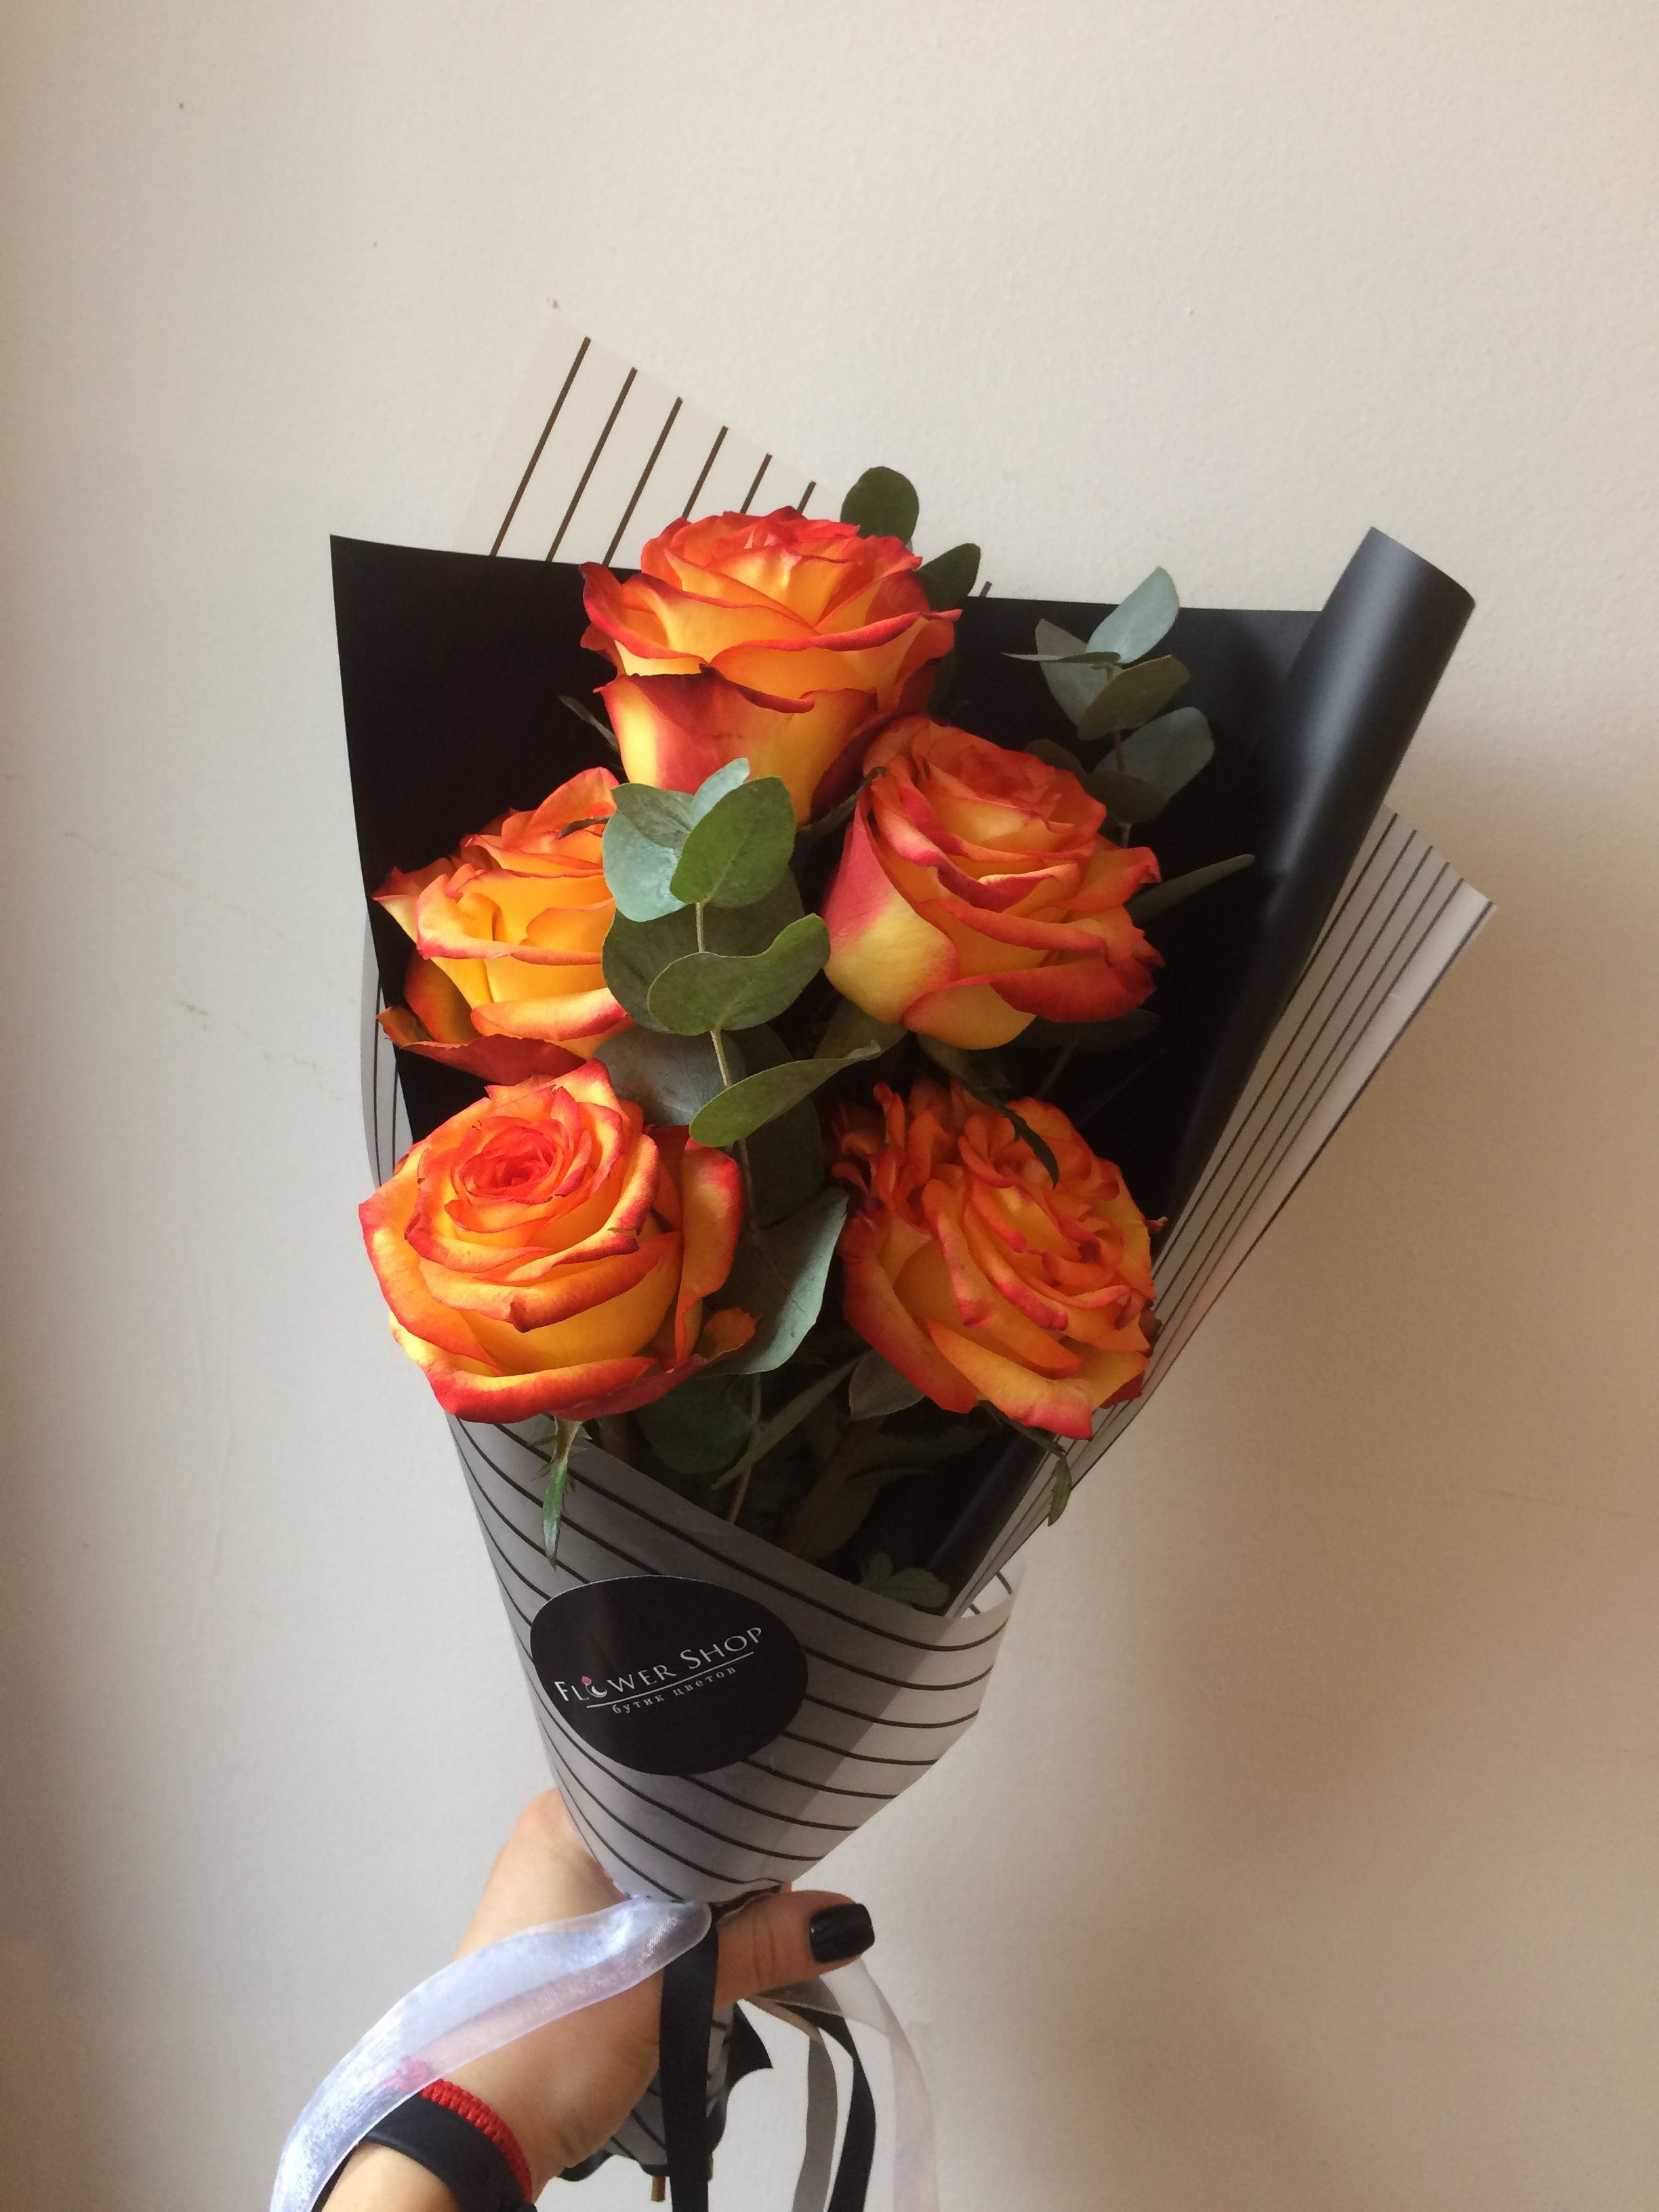 Korejskaya Upakovka Buketa Flowers Bouquet Flowers Bouquet Gift Flowers Online